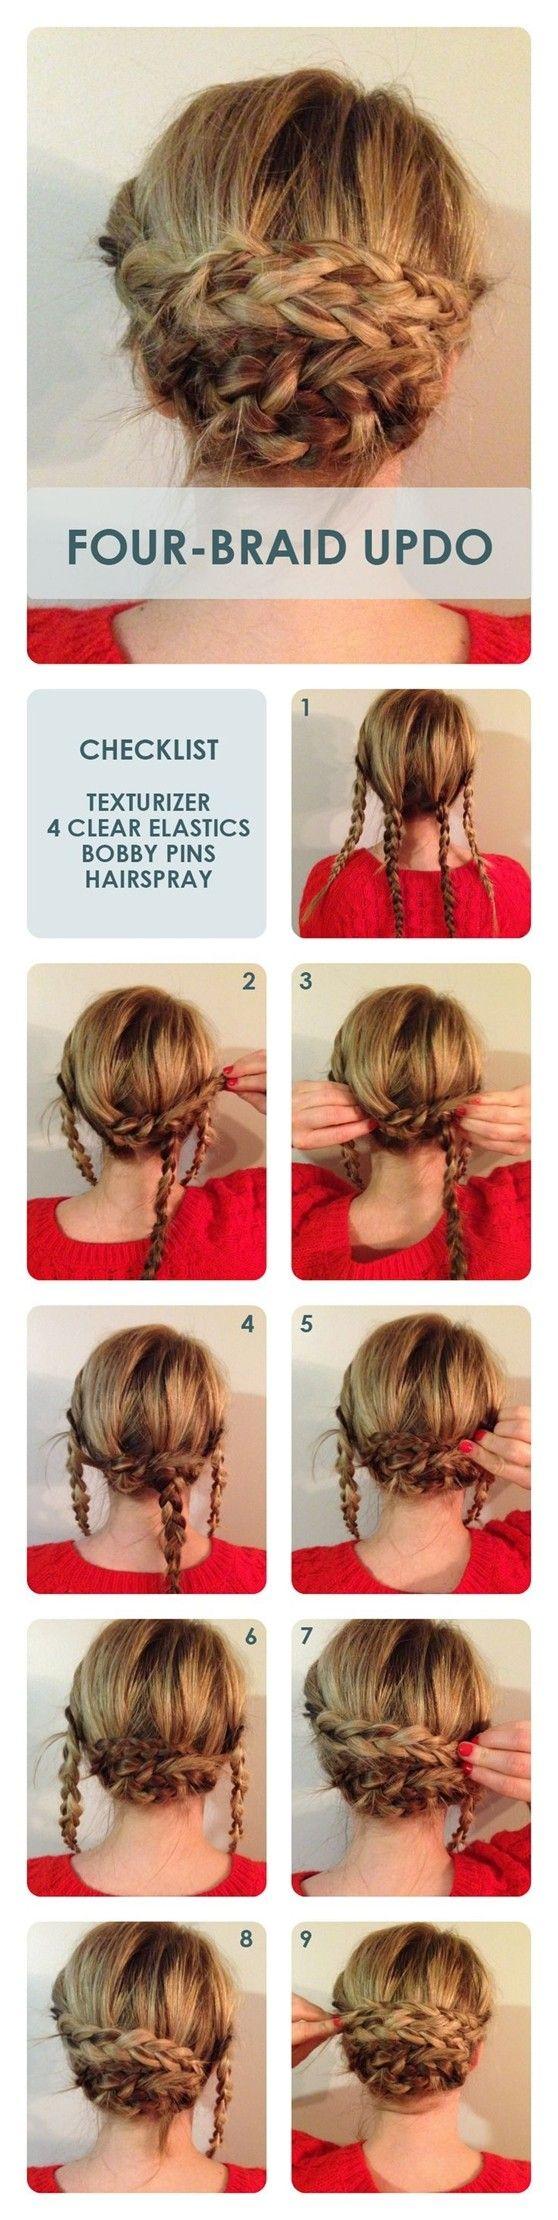 braided bun updos ideas hair pinterest updos updo and thin